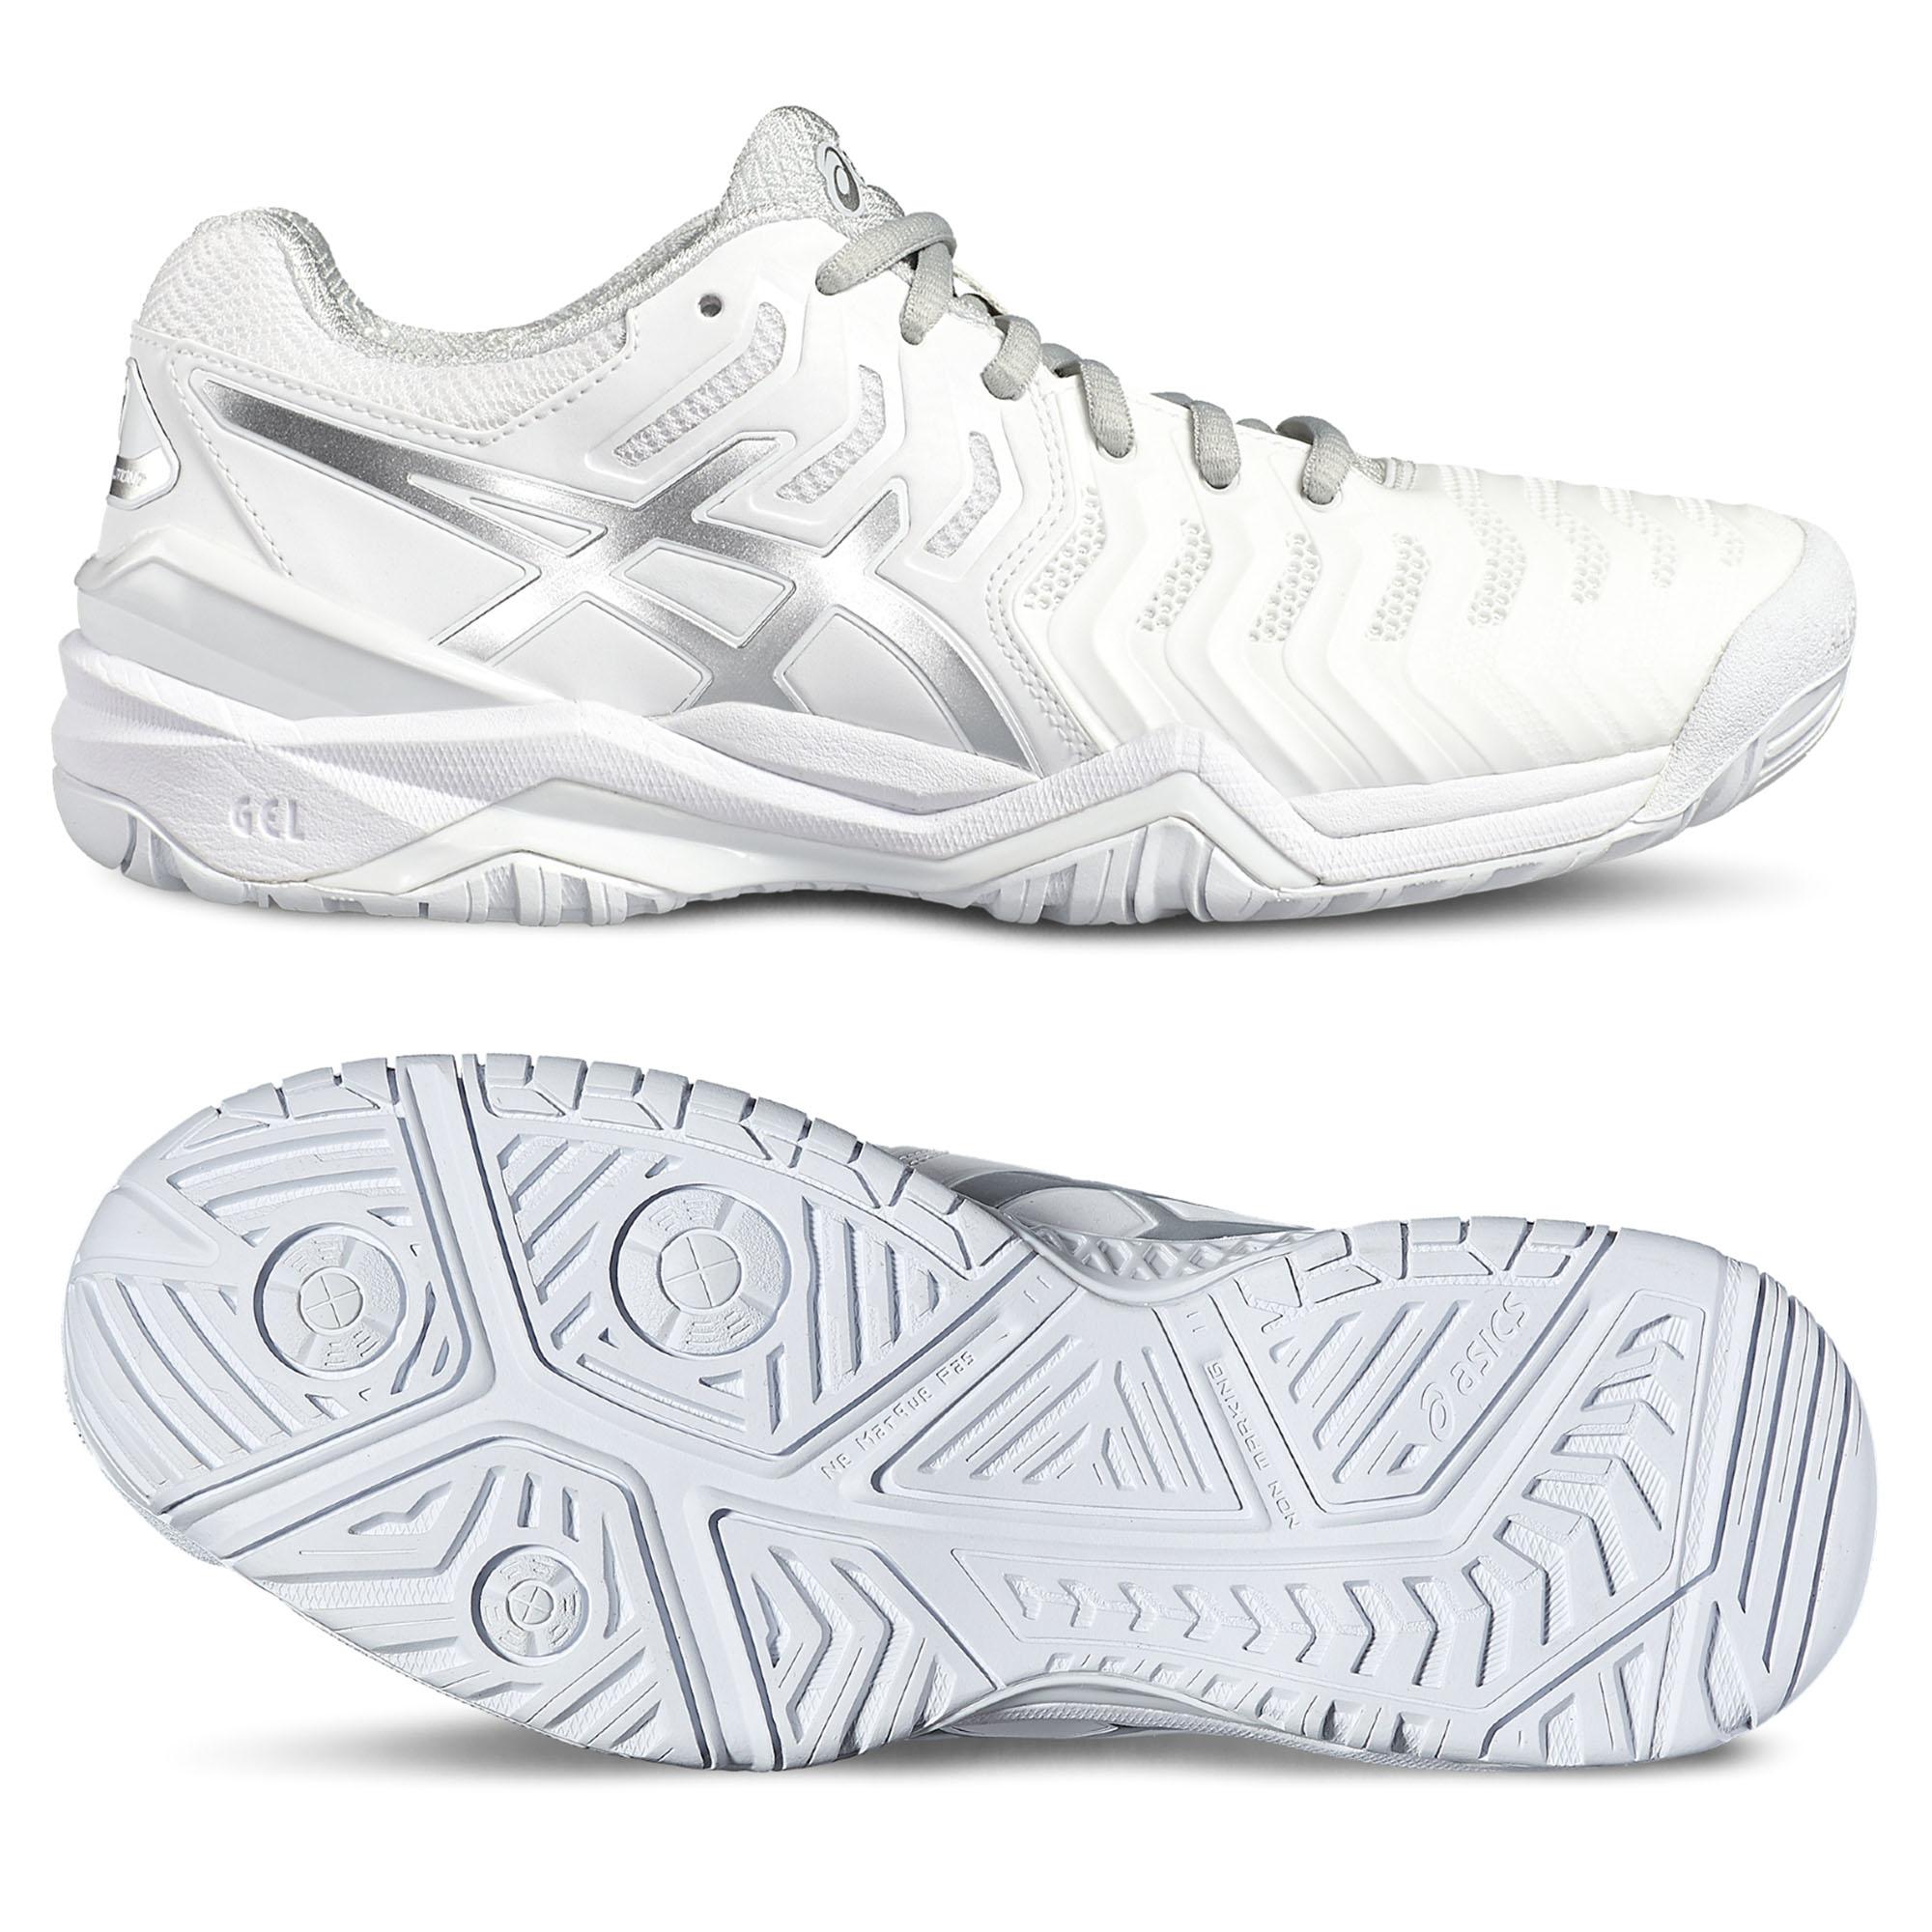 Asics GelResolution 7 Ladies Tennis Shoes  WhiteSilver 7.5 UK